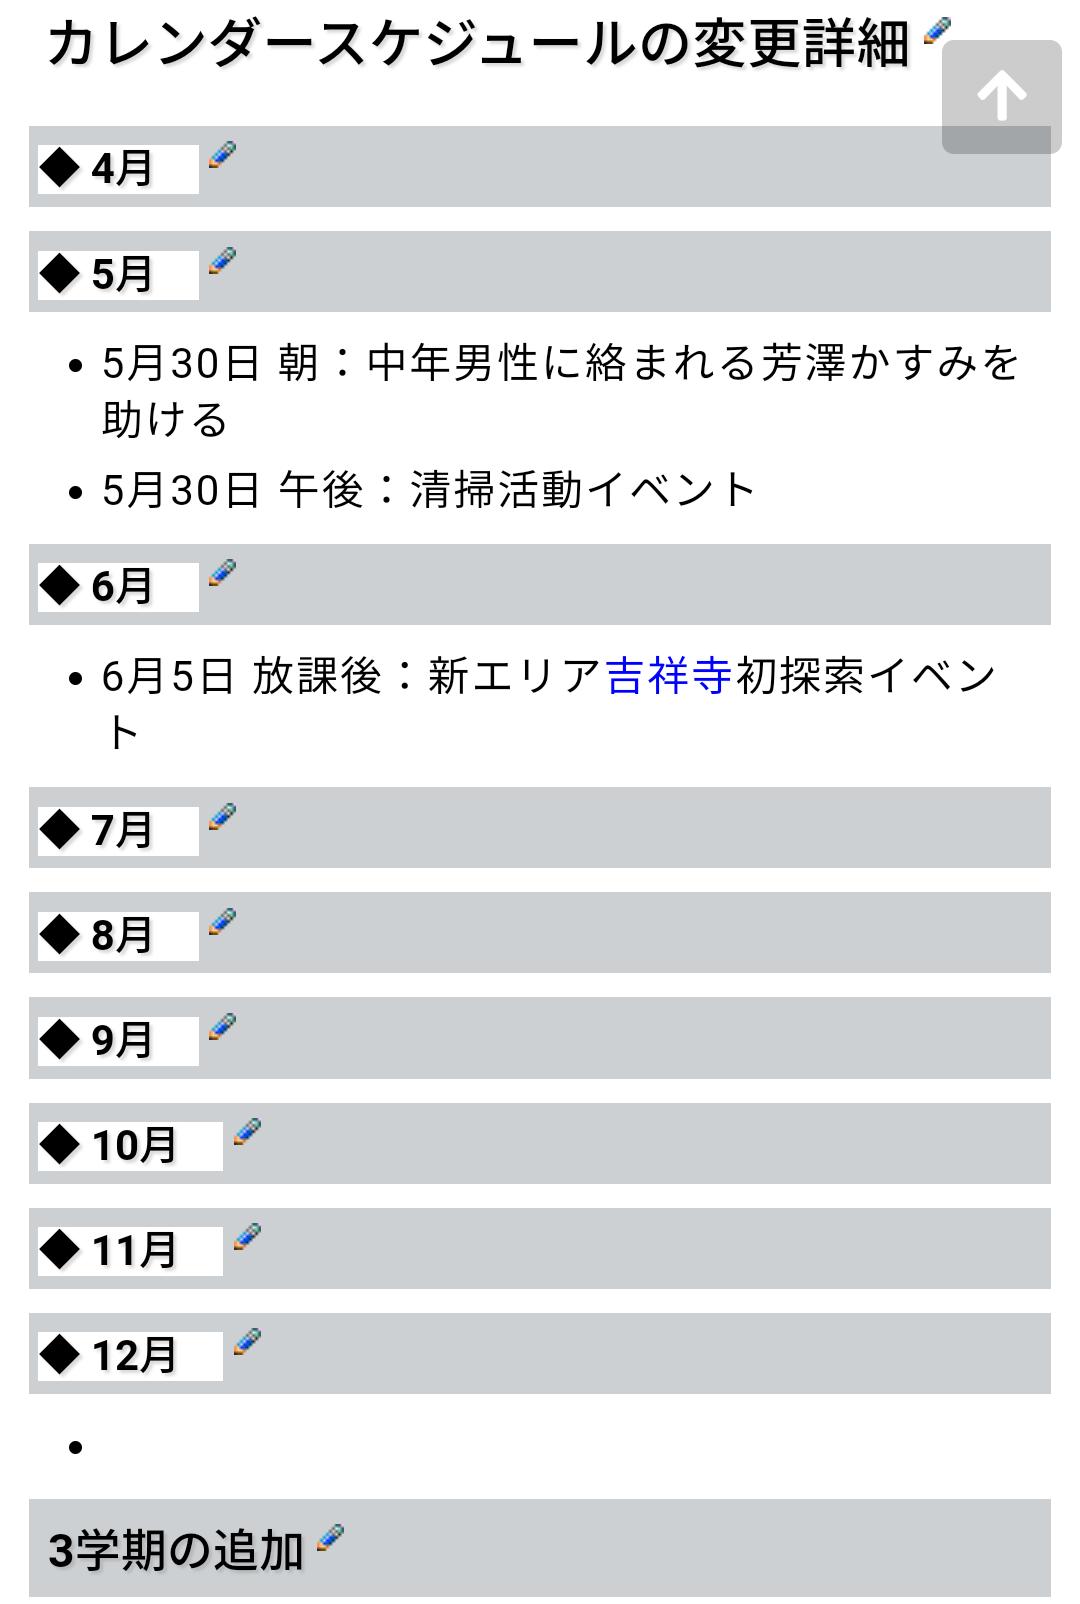 u8ZYQXF - 【49%OFF】PS4『ペルソナ5R』定価9680円→4999円